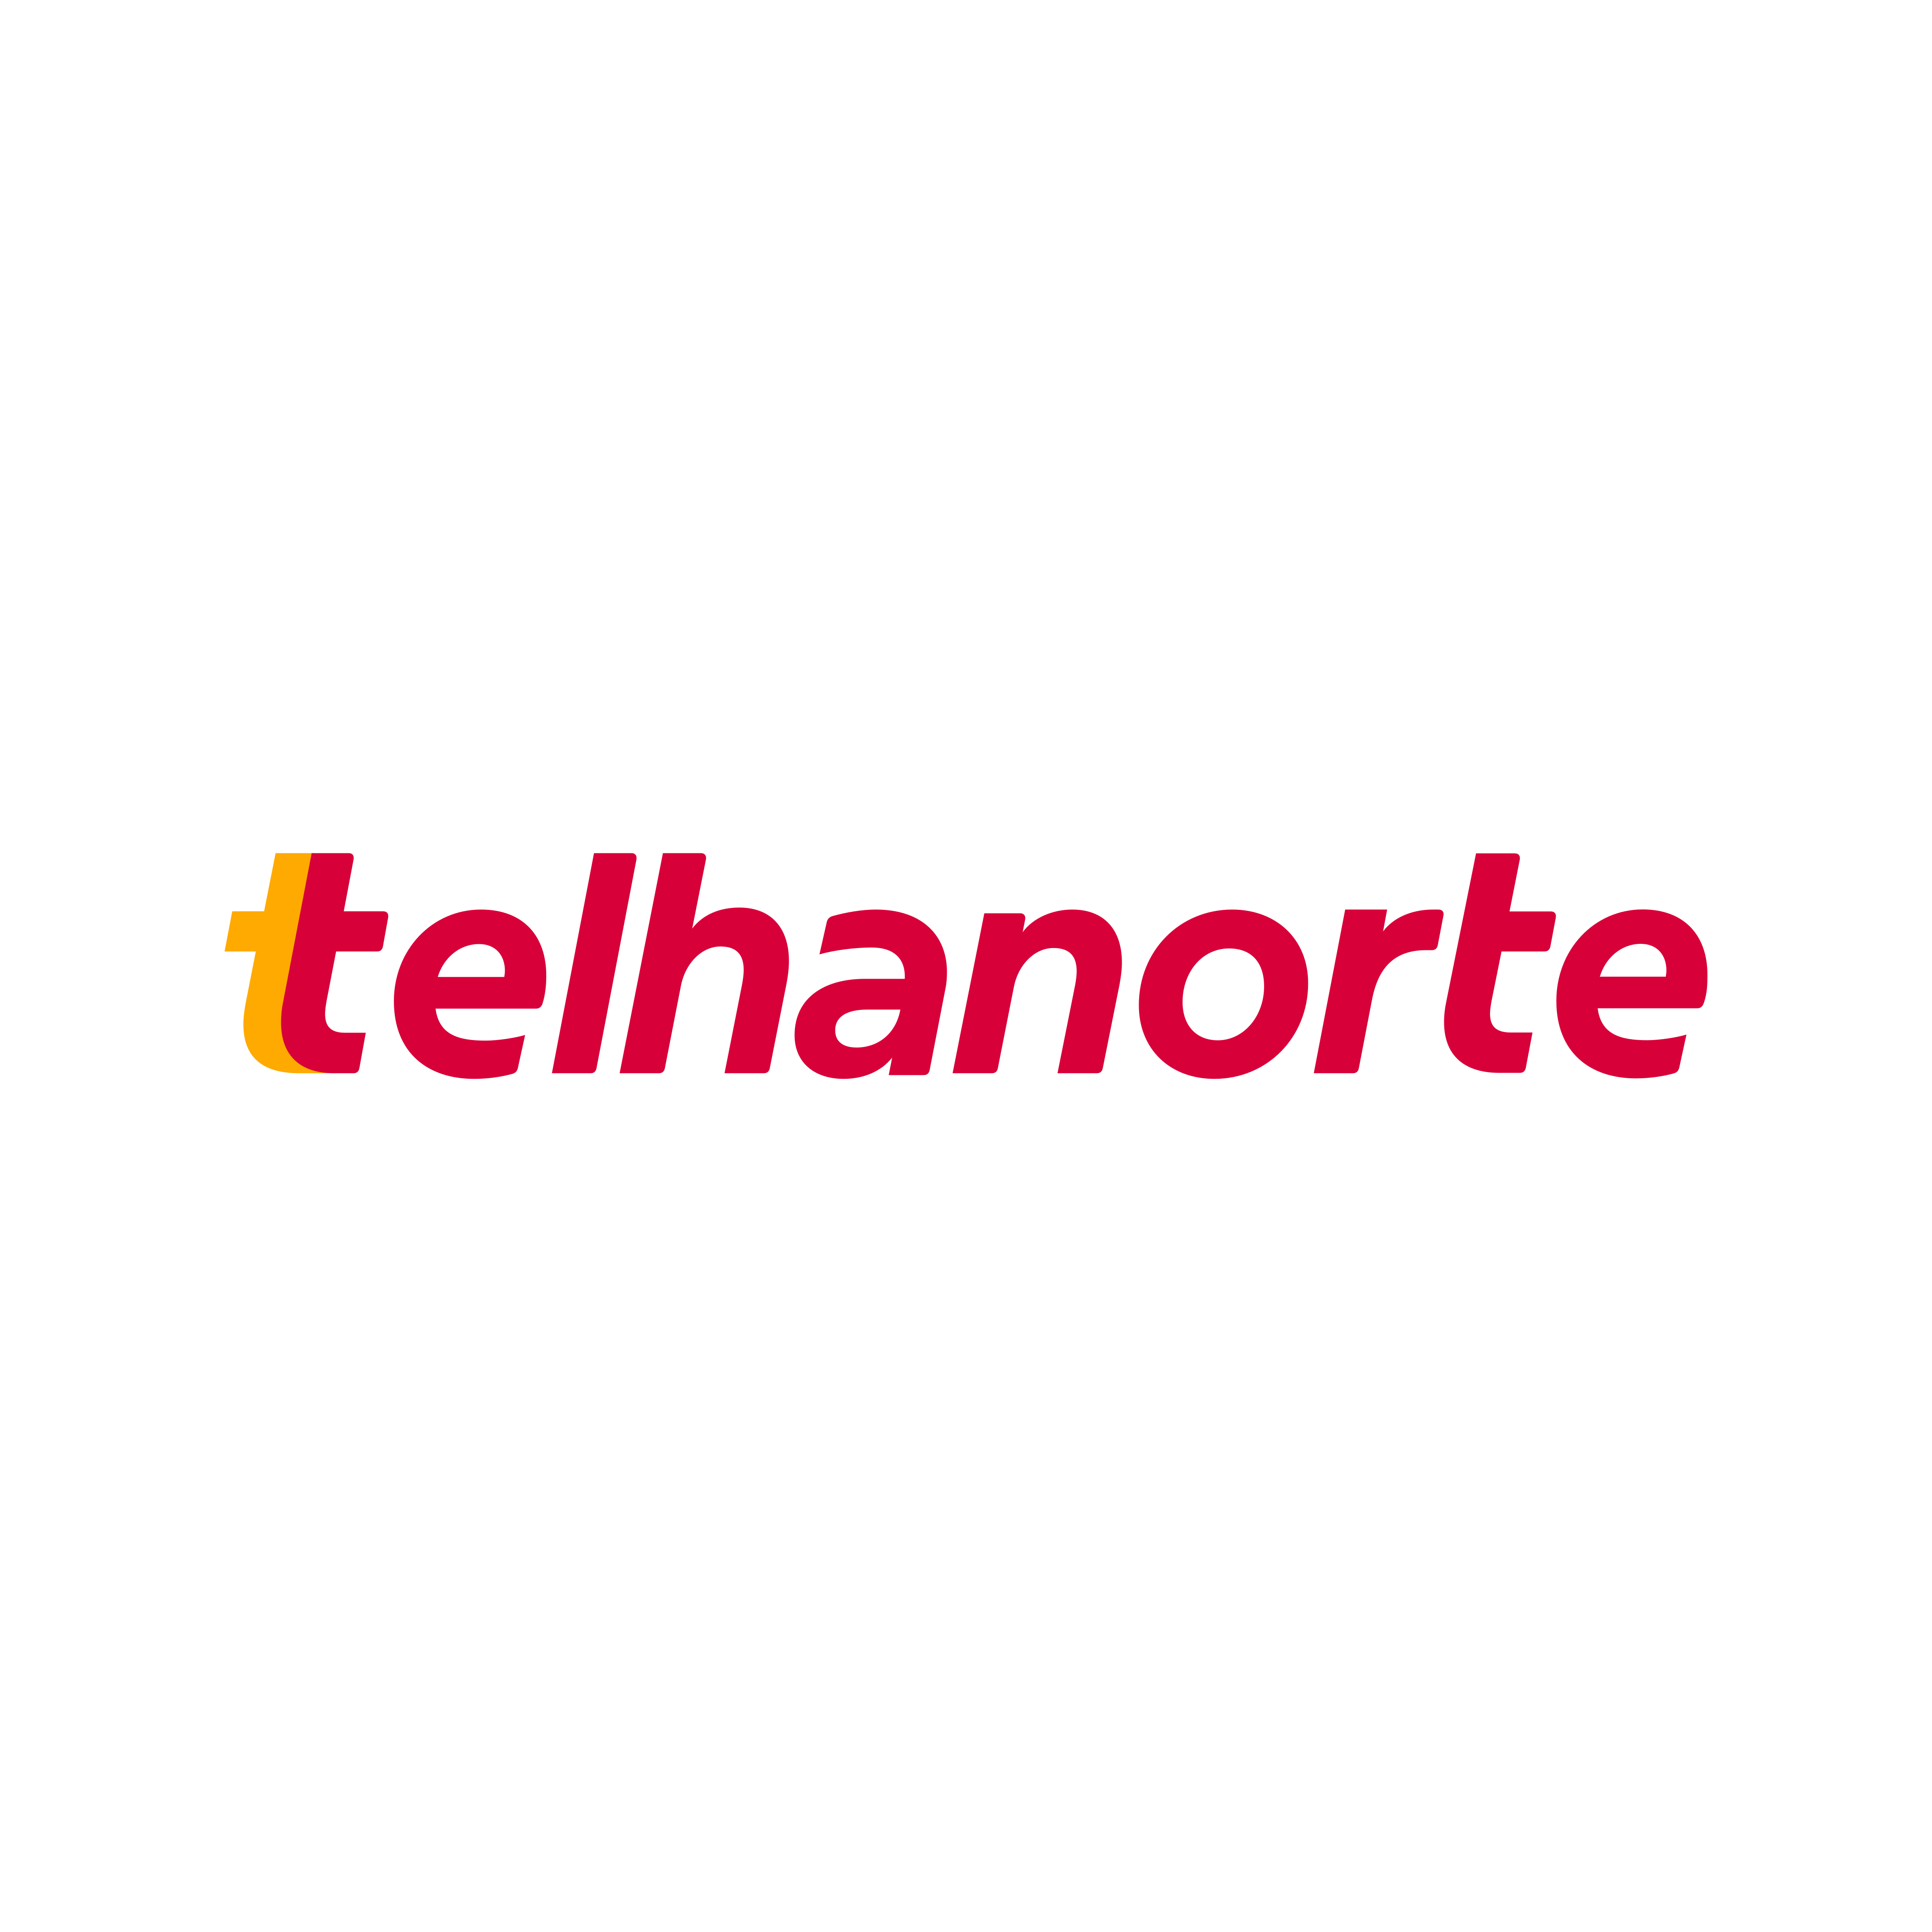 telhanorte logo 0 - Telhanorte Logo